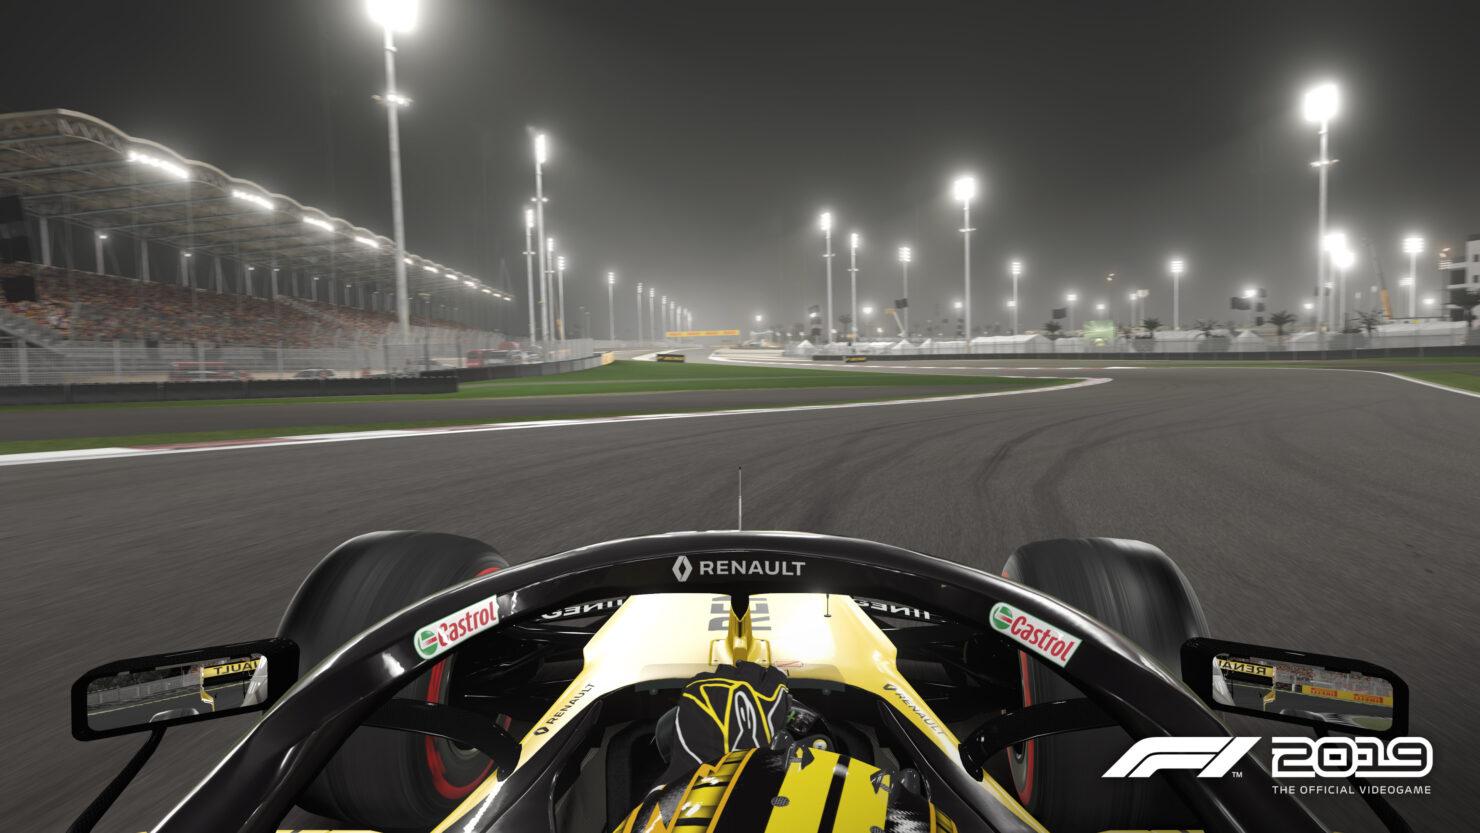 f1-2019-night-lighting-comparison-02-part-4-bahrain-2019-02